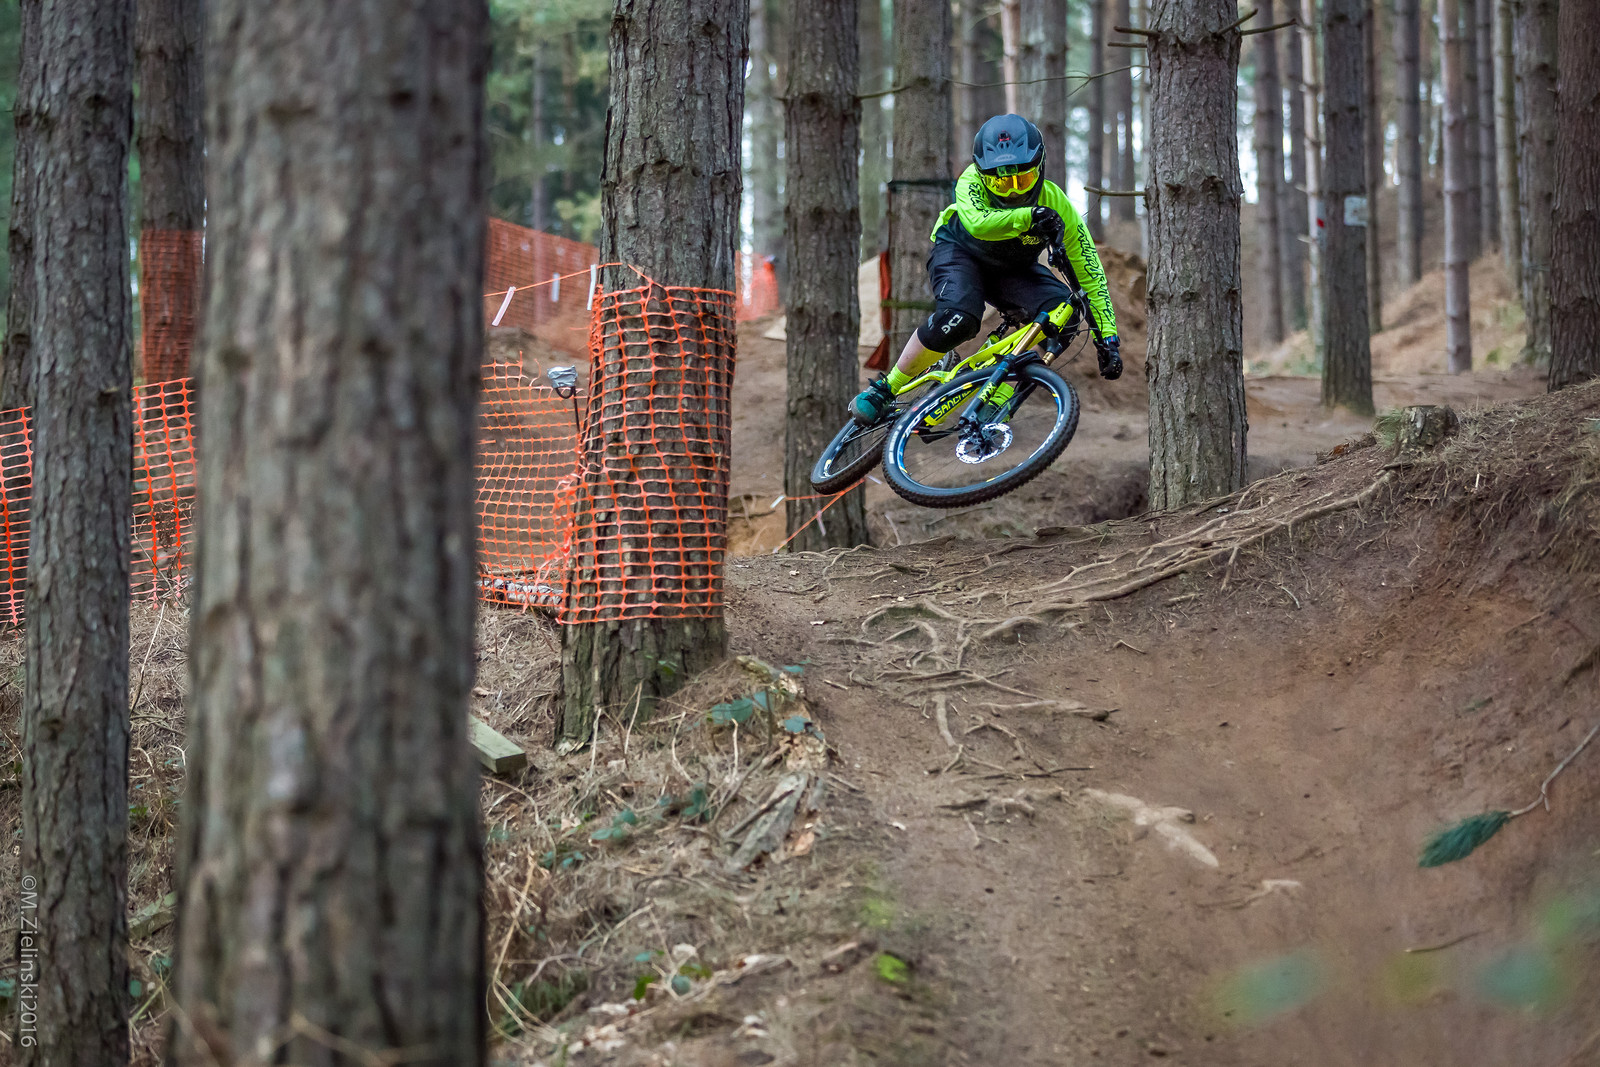 Miss Joey Gough shredding Chicksands bike park - mzed - Mountain Biking Pictures - Vital MTB